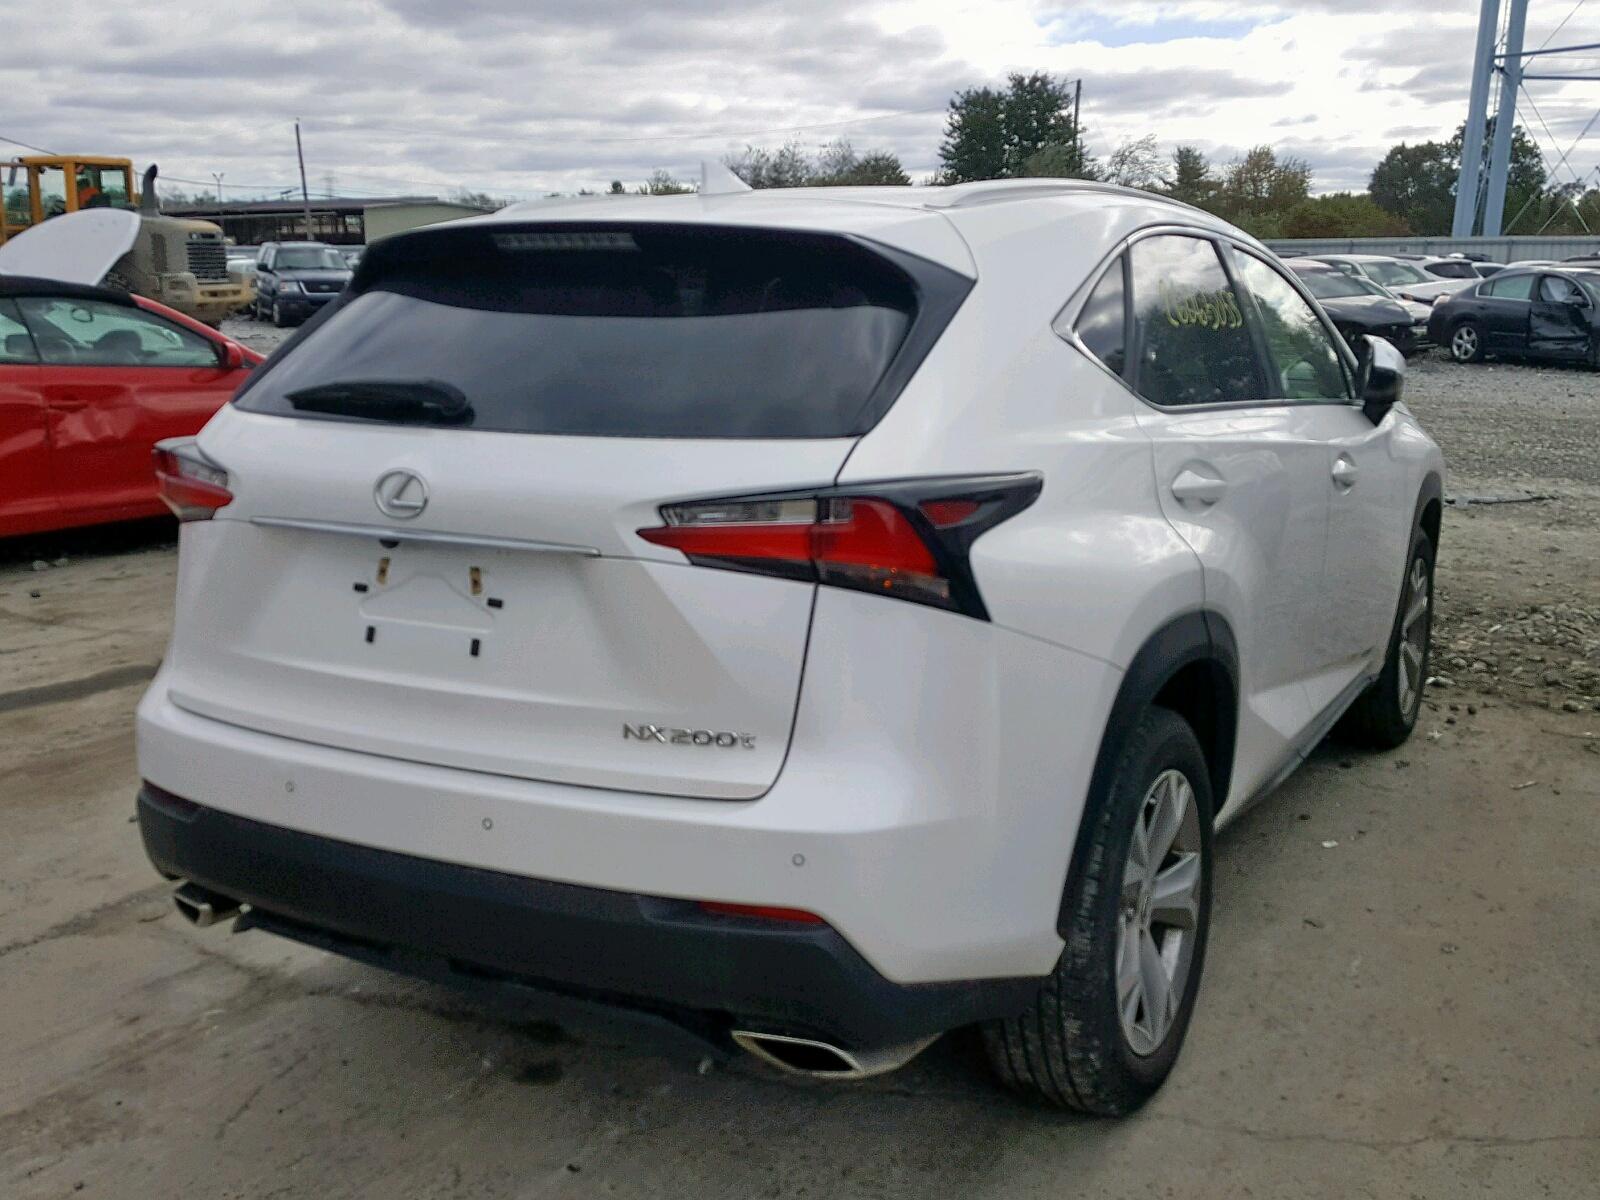 JTJBARBZ0H2096456 - 2017 Lexus Nx 200T Ba 2.0L rear view